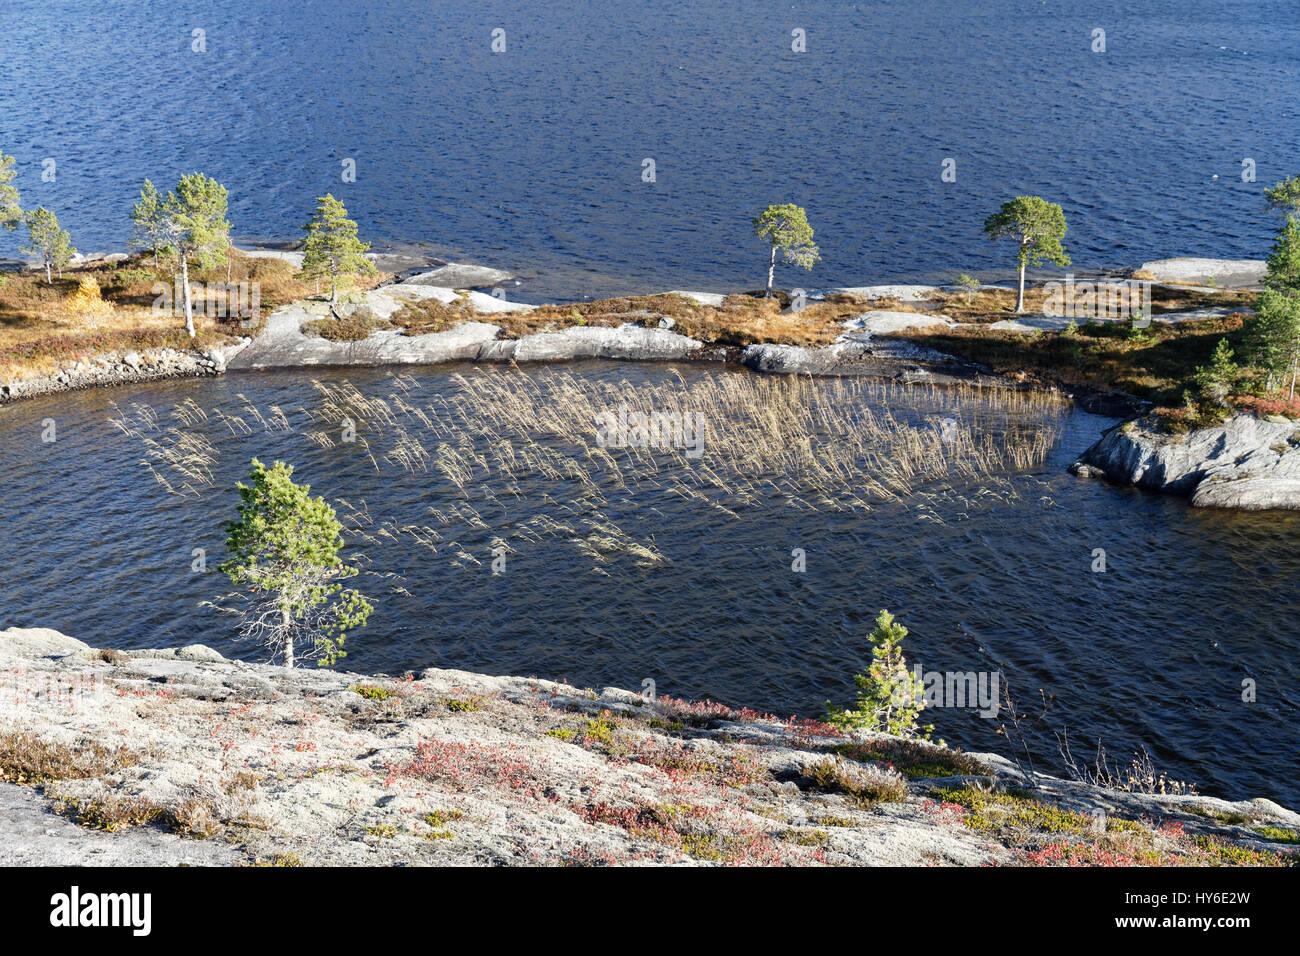 Grass growing in a lake in Heggmoen, Norway - Stock Image